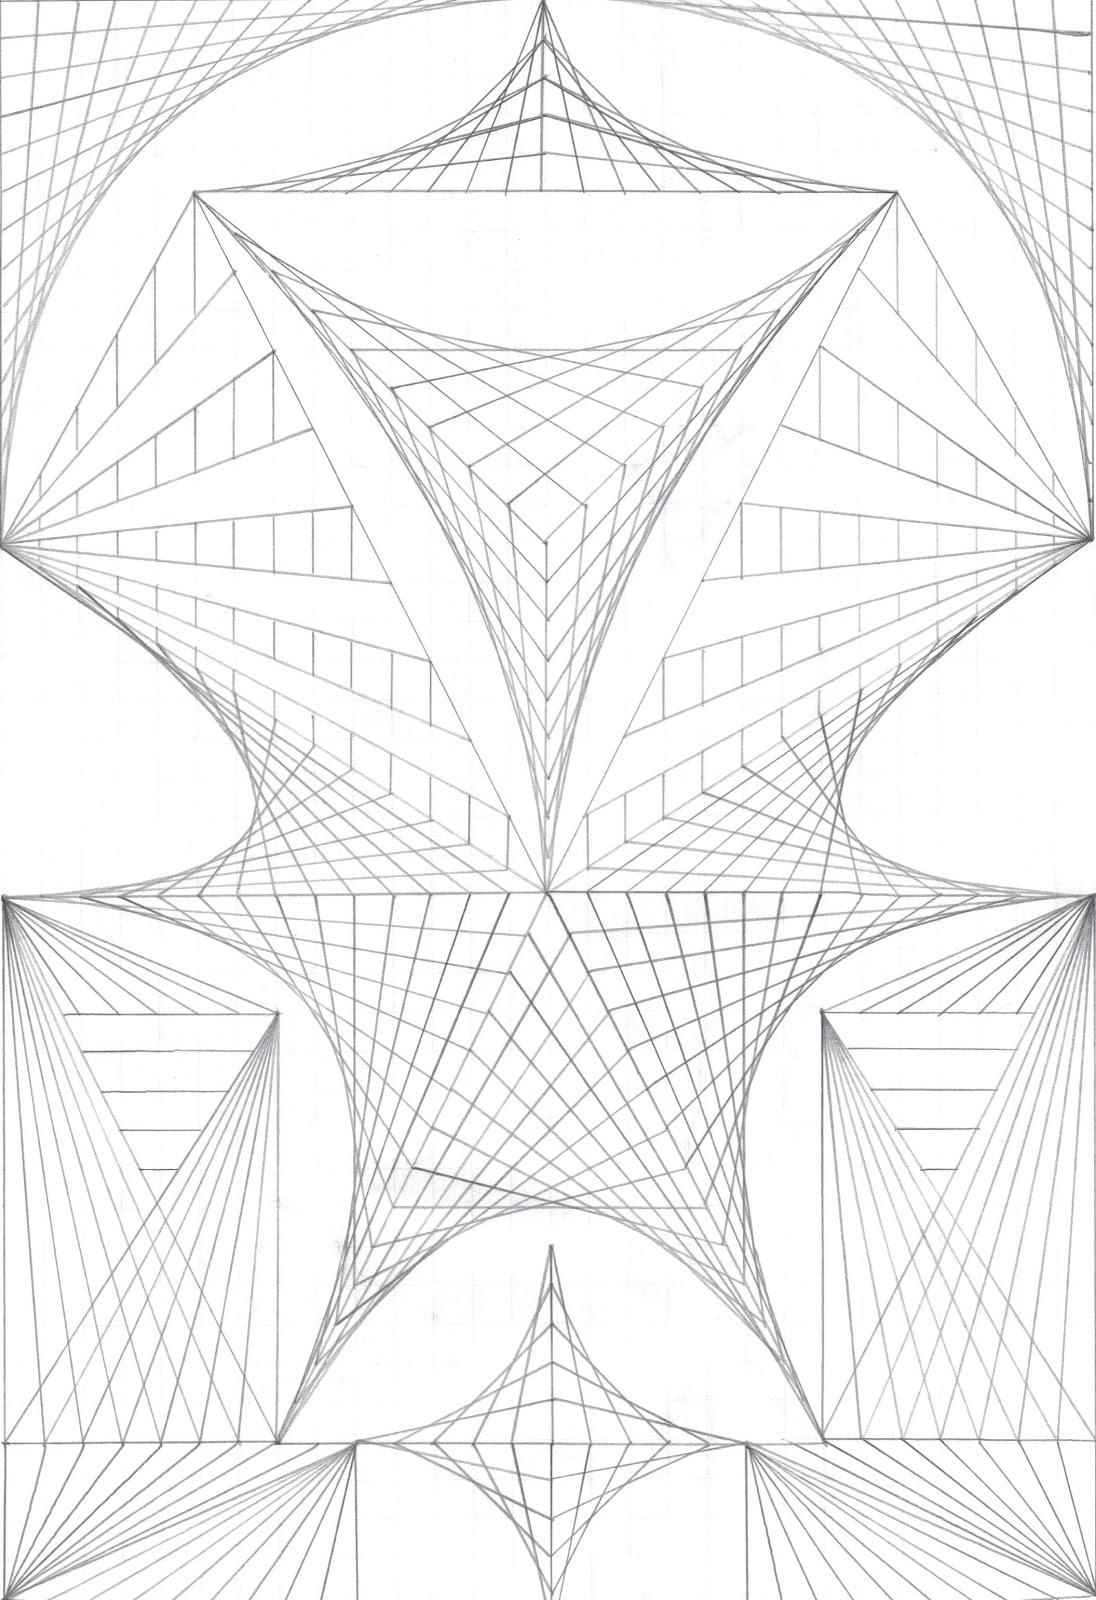 1096x1600 Drawings On Grid Paper